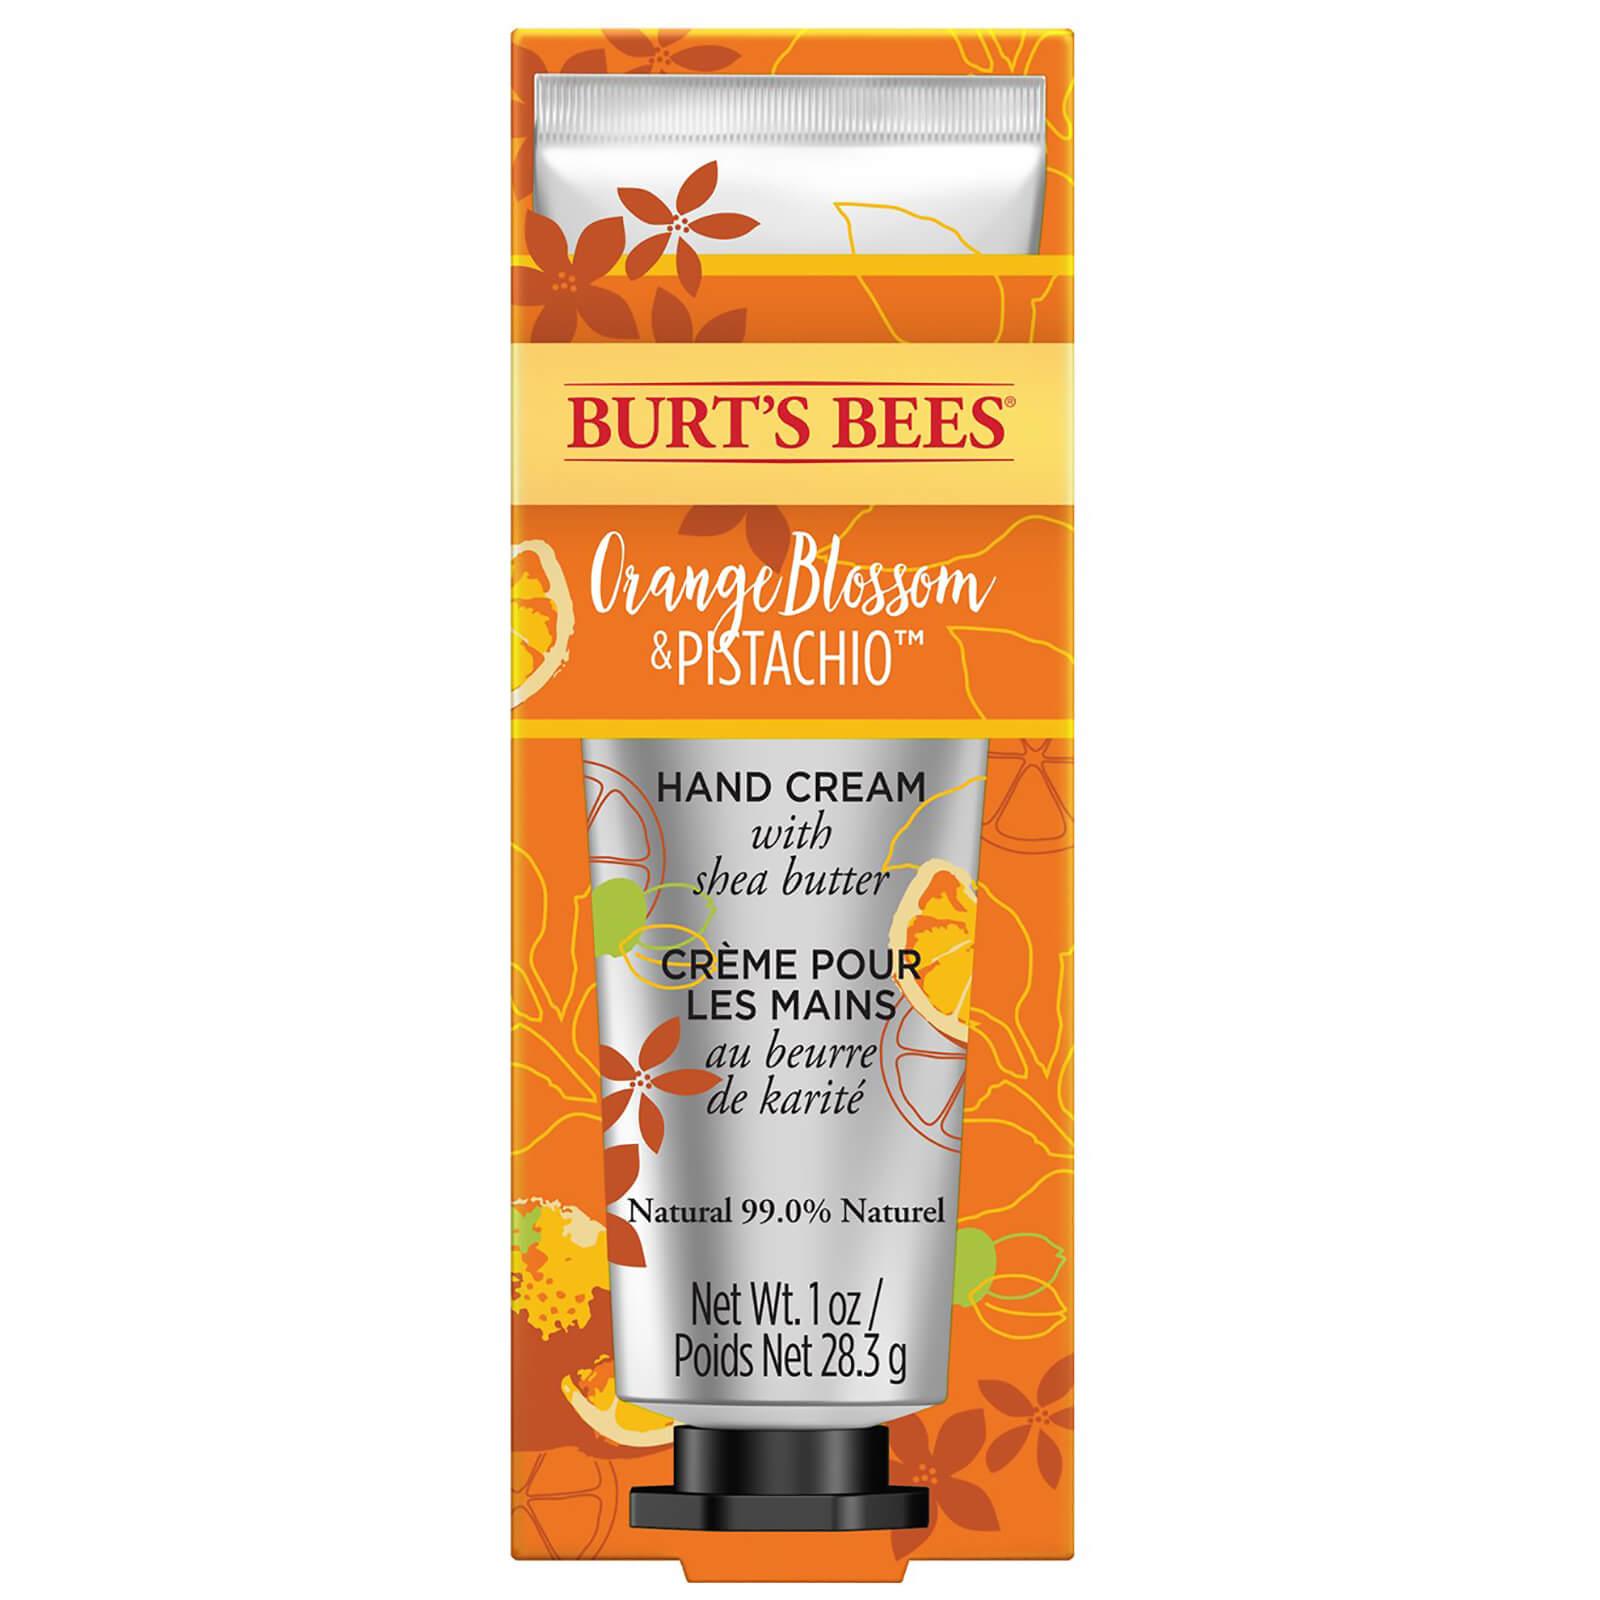 Orange Blossom & Pistachio Hand Cream 28.3g